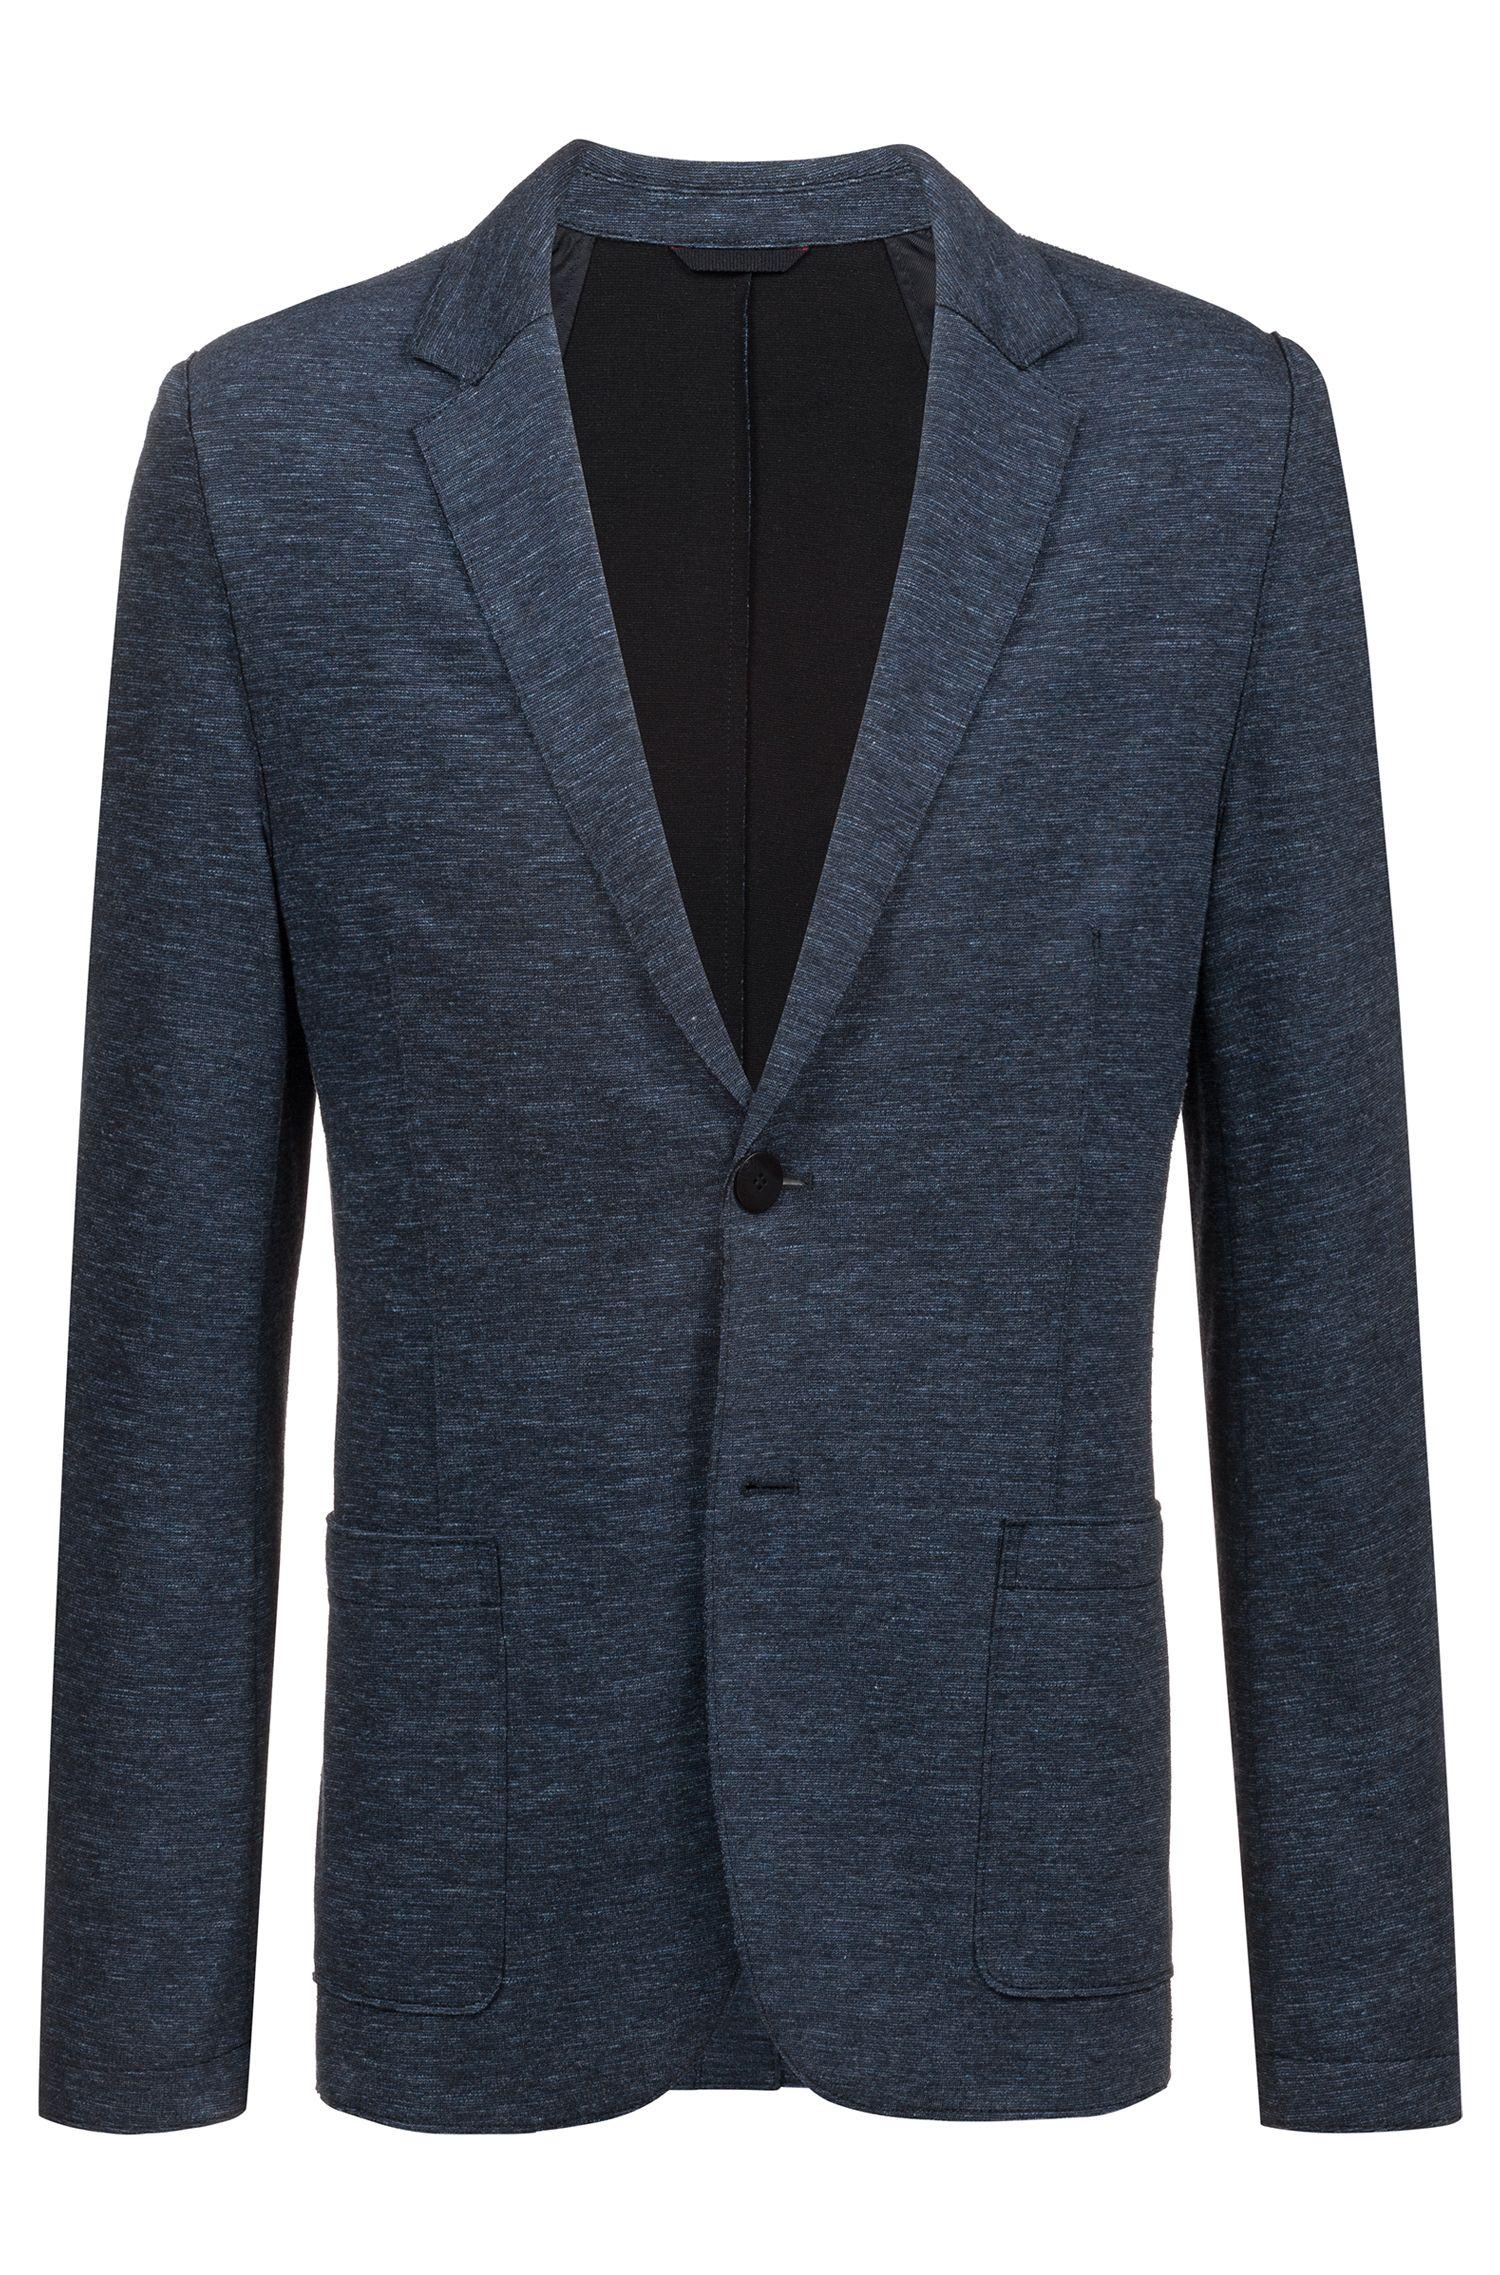 Extra-slim-fit jacket in raw-edge jersey, Dark Blue